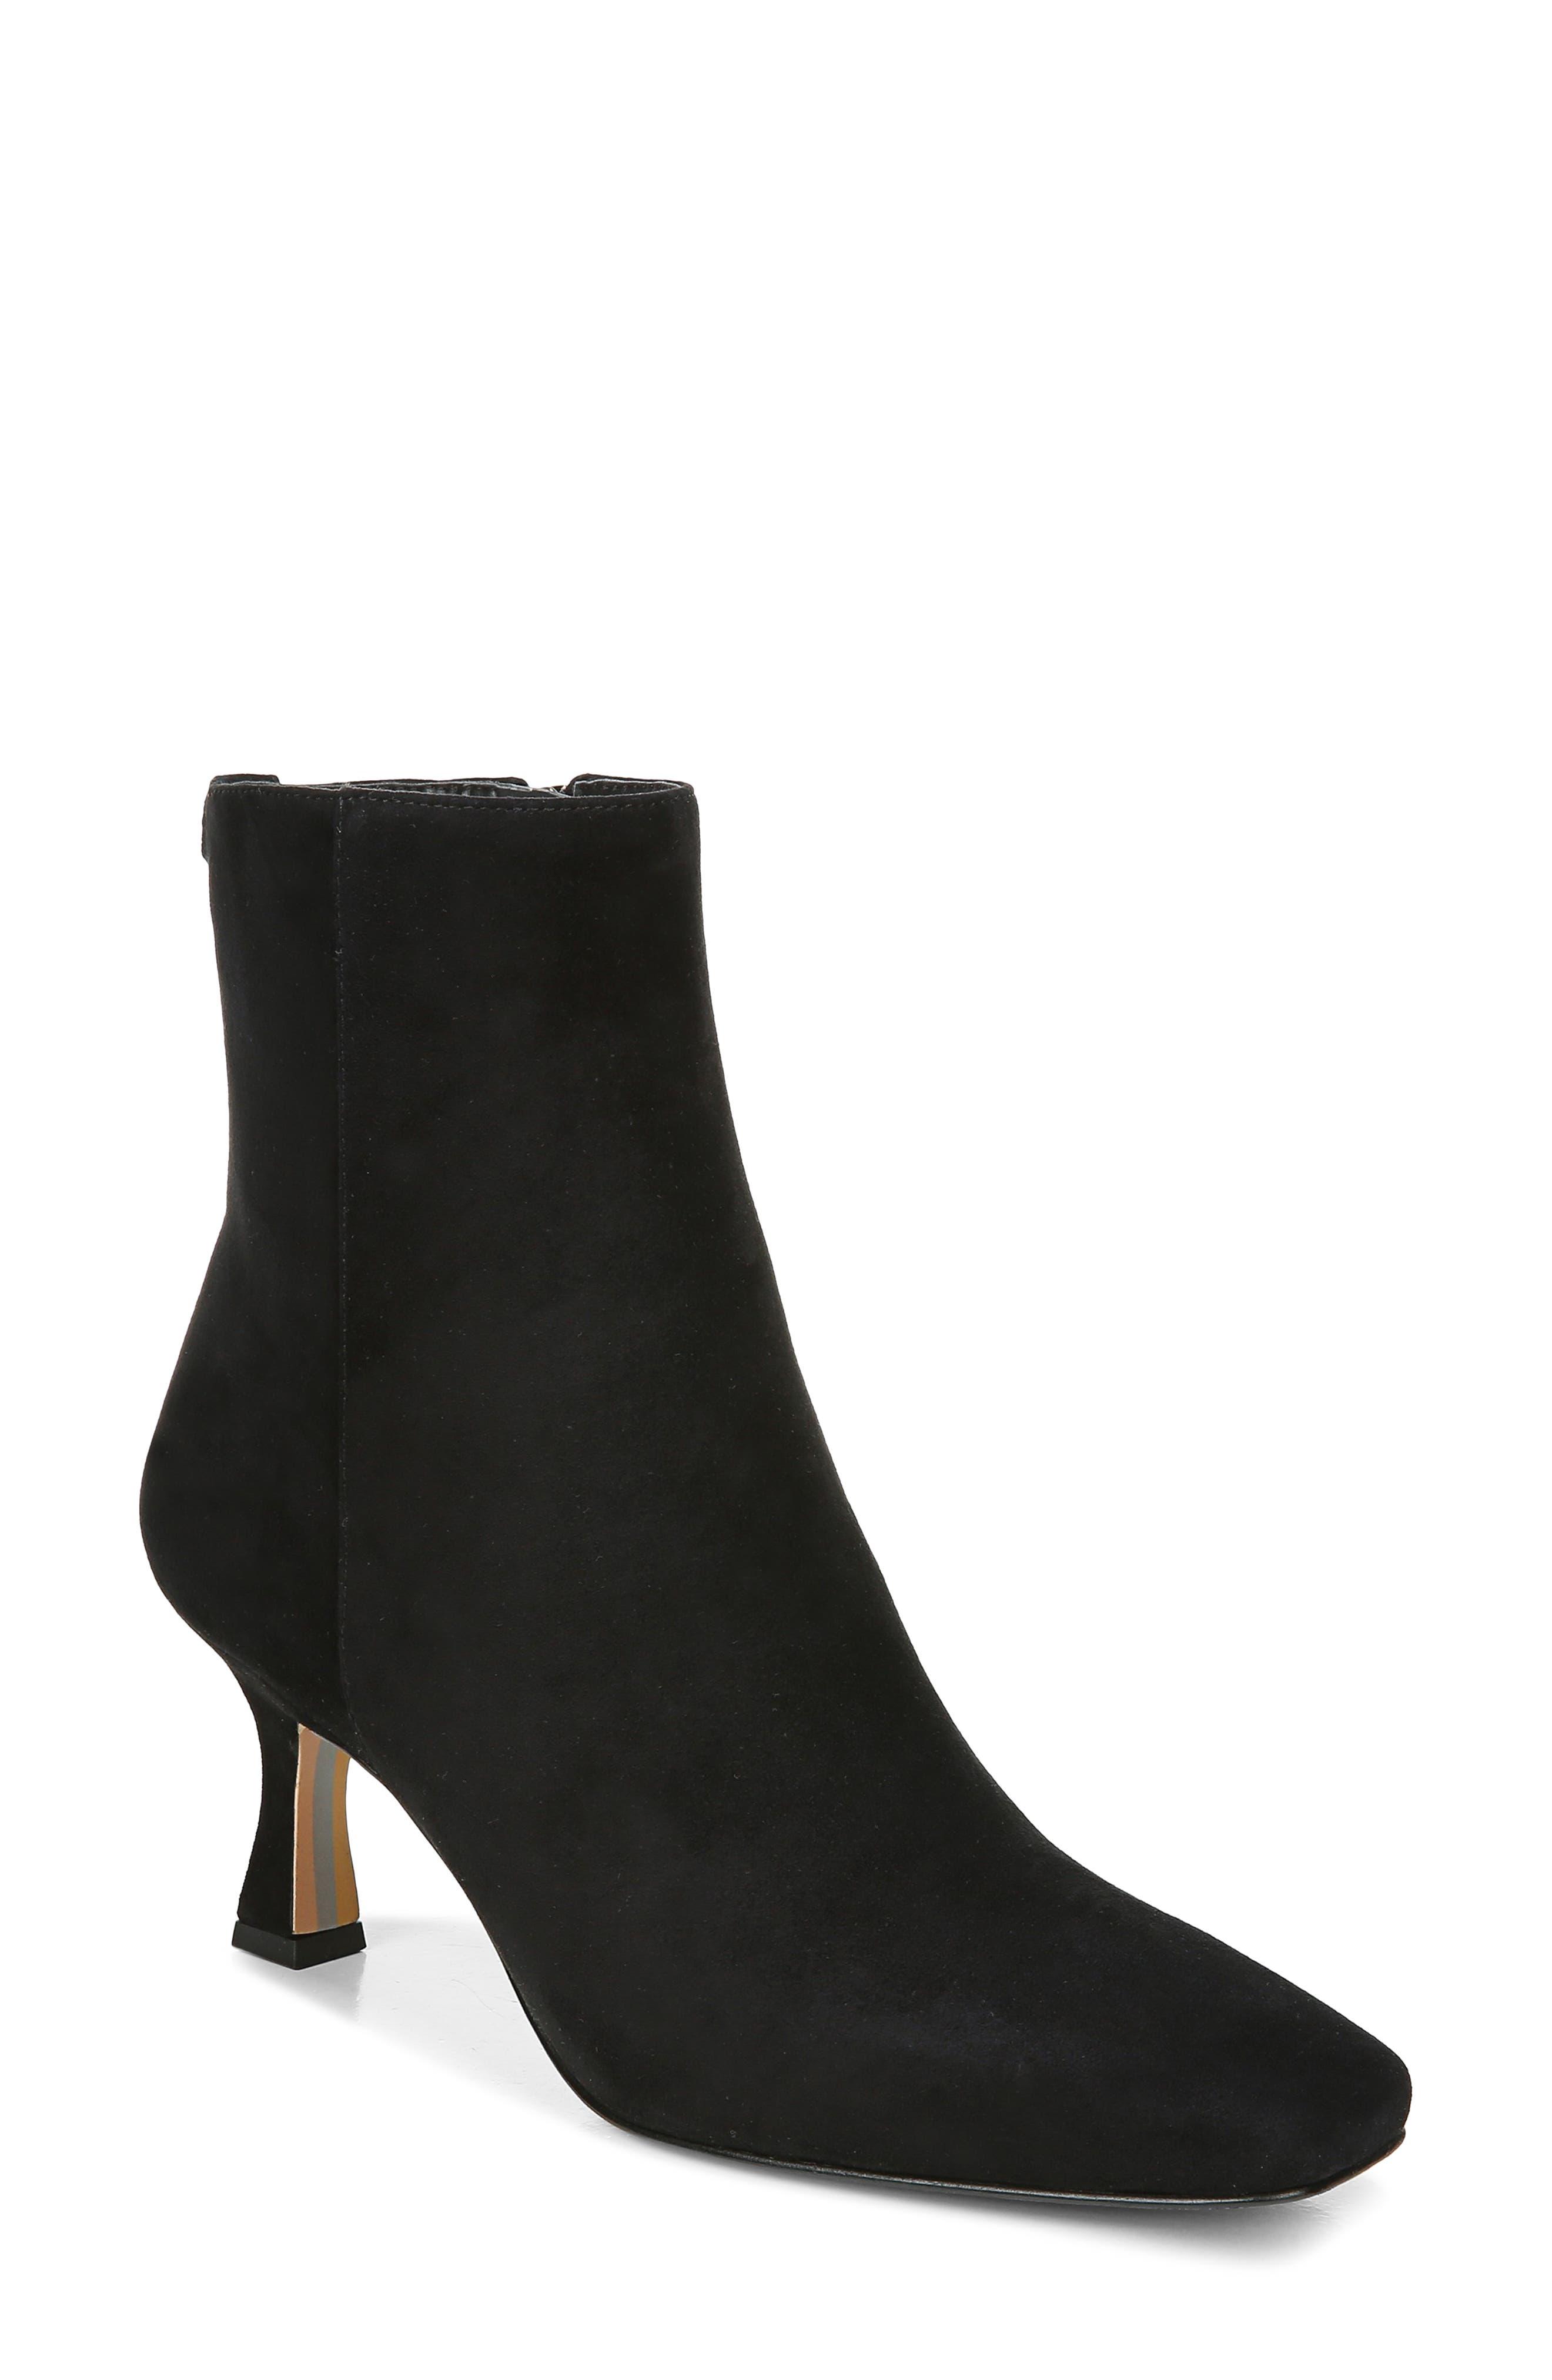 Angel Rhinestone Embellished Mid Calf Low Heel Round Toe Fashion Boots Pazzle